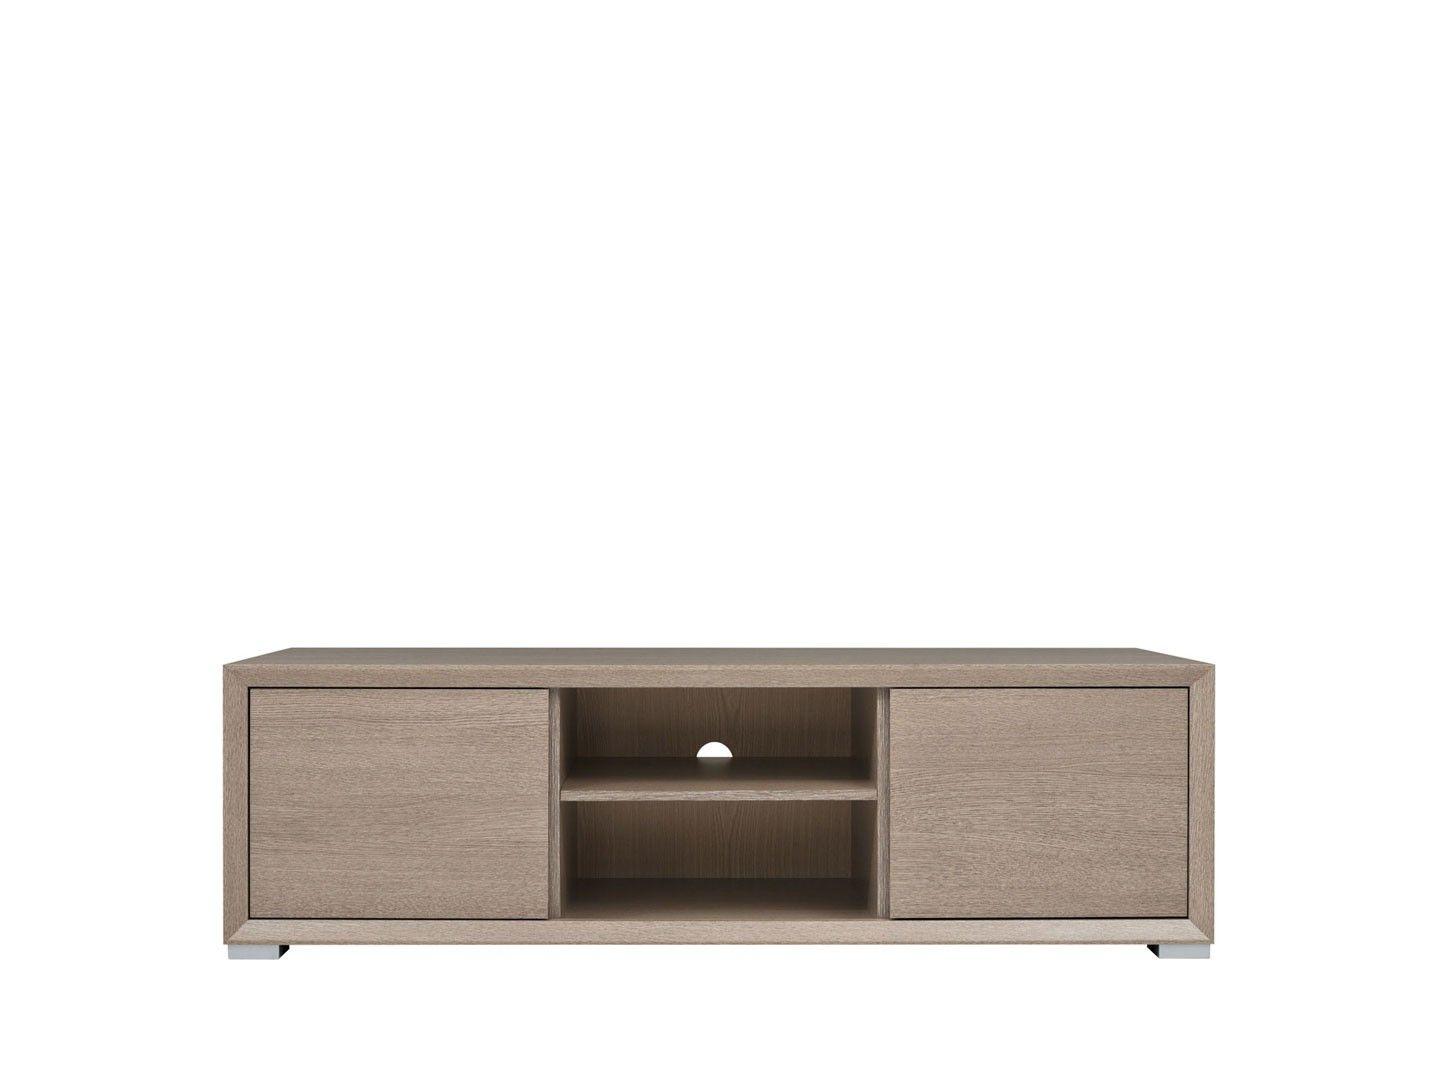 Szafka Rtv Rabesca Furniture Home Decor Decor